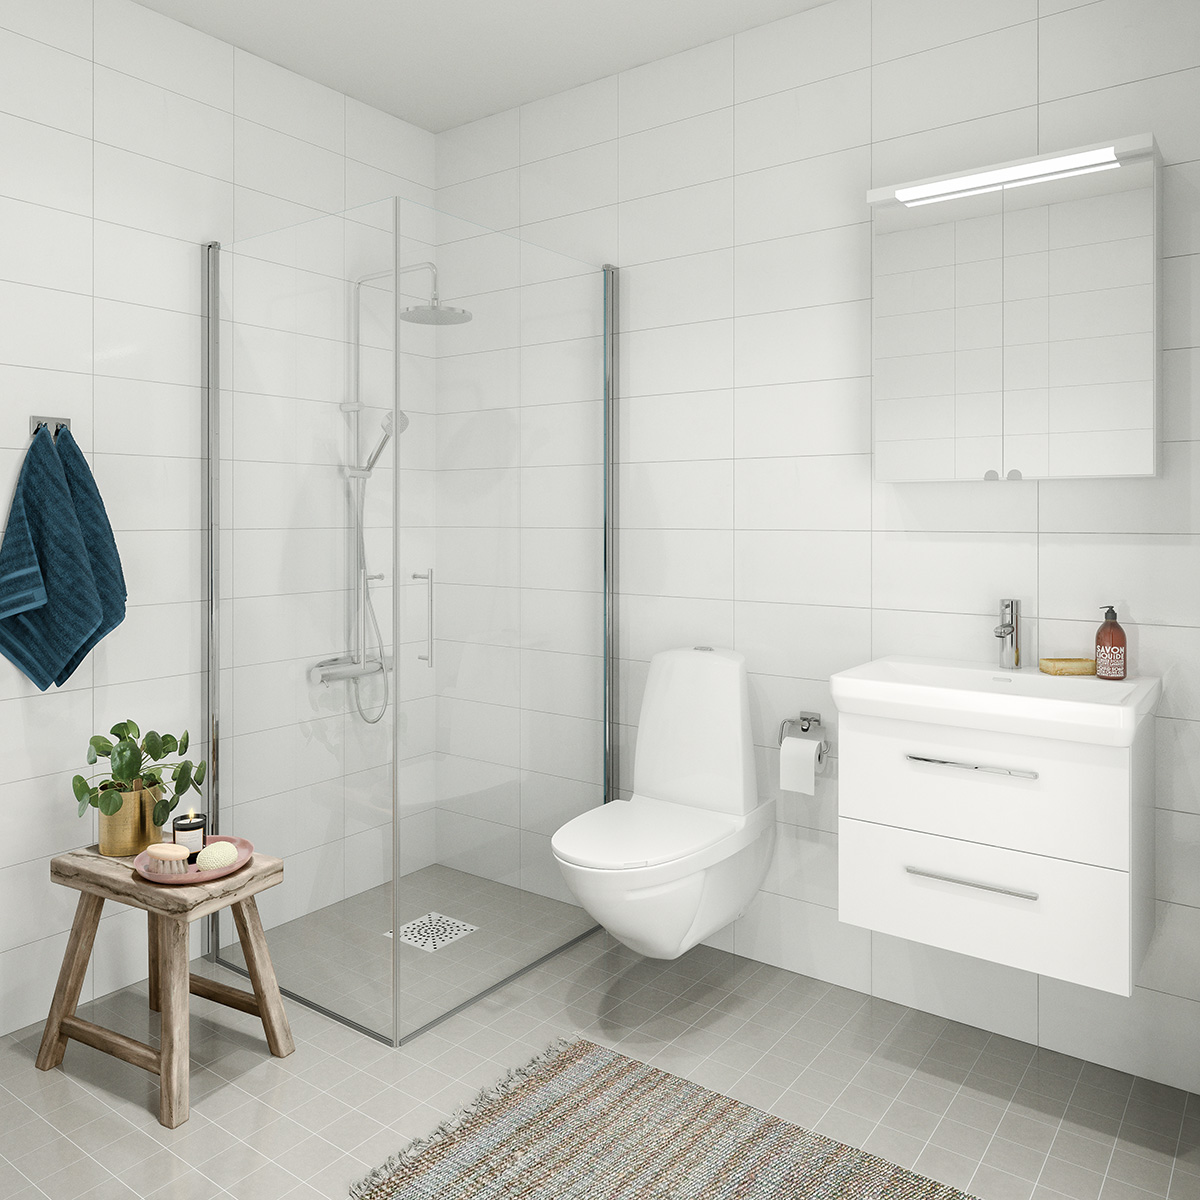 Krokslatts-fabriker-Interior-Bathroom